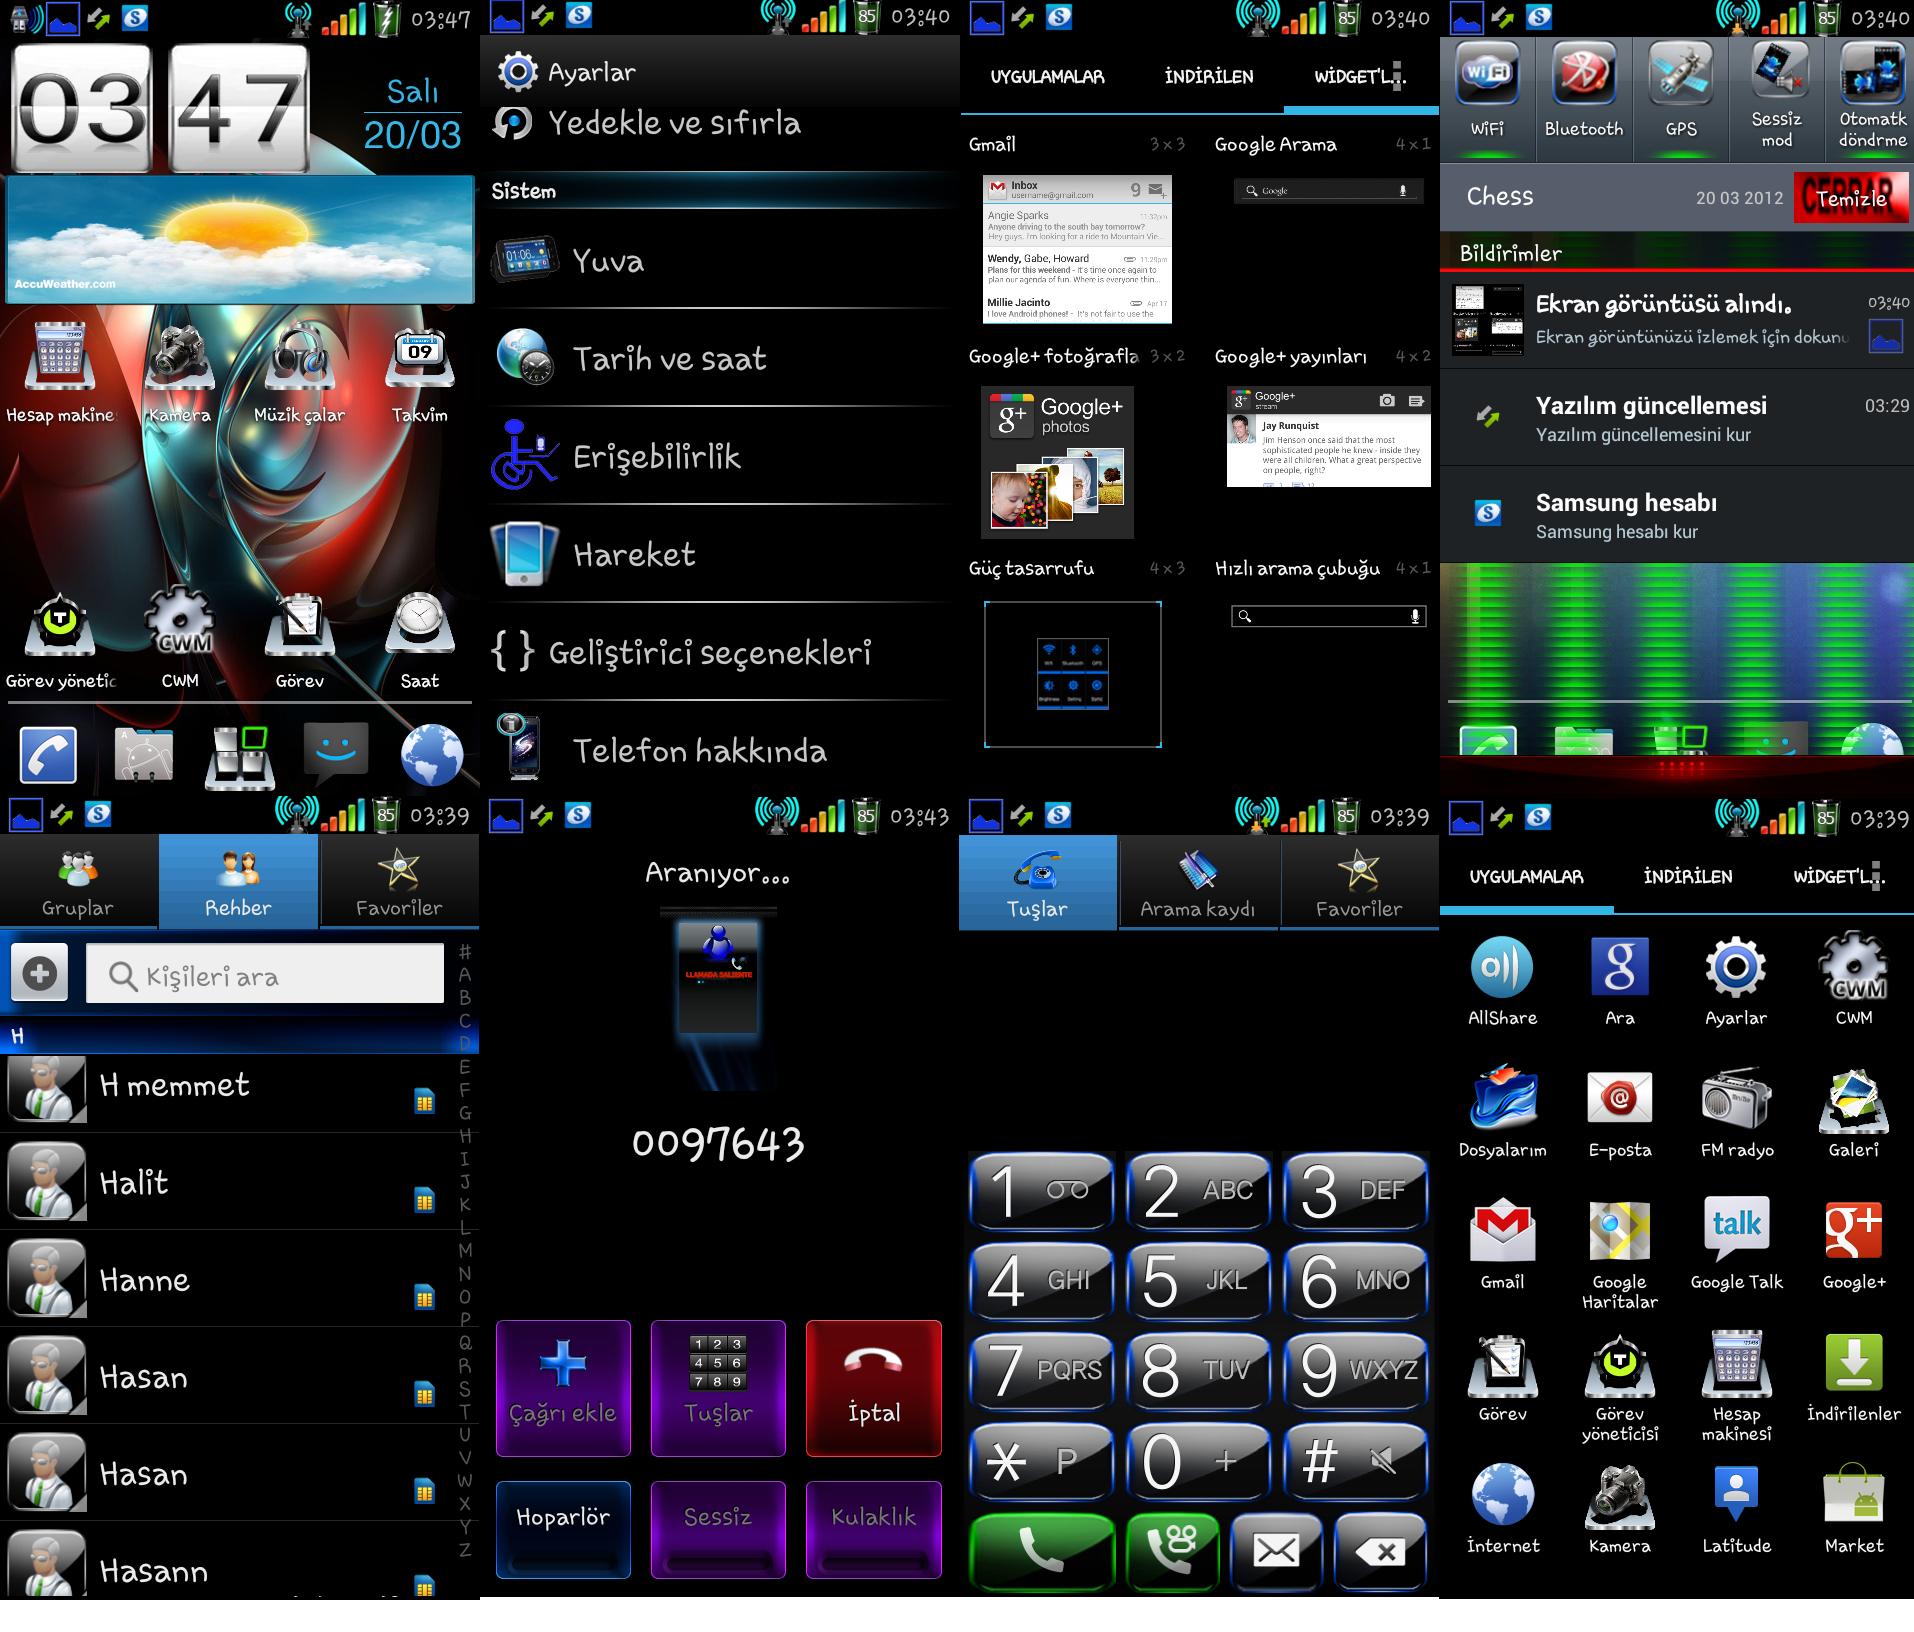 screenshot2012032003470.png